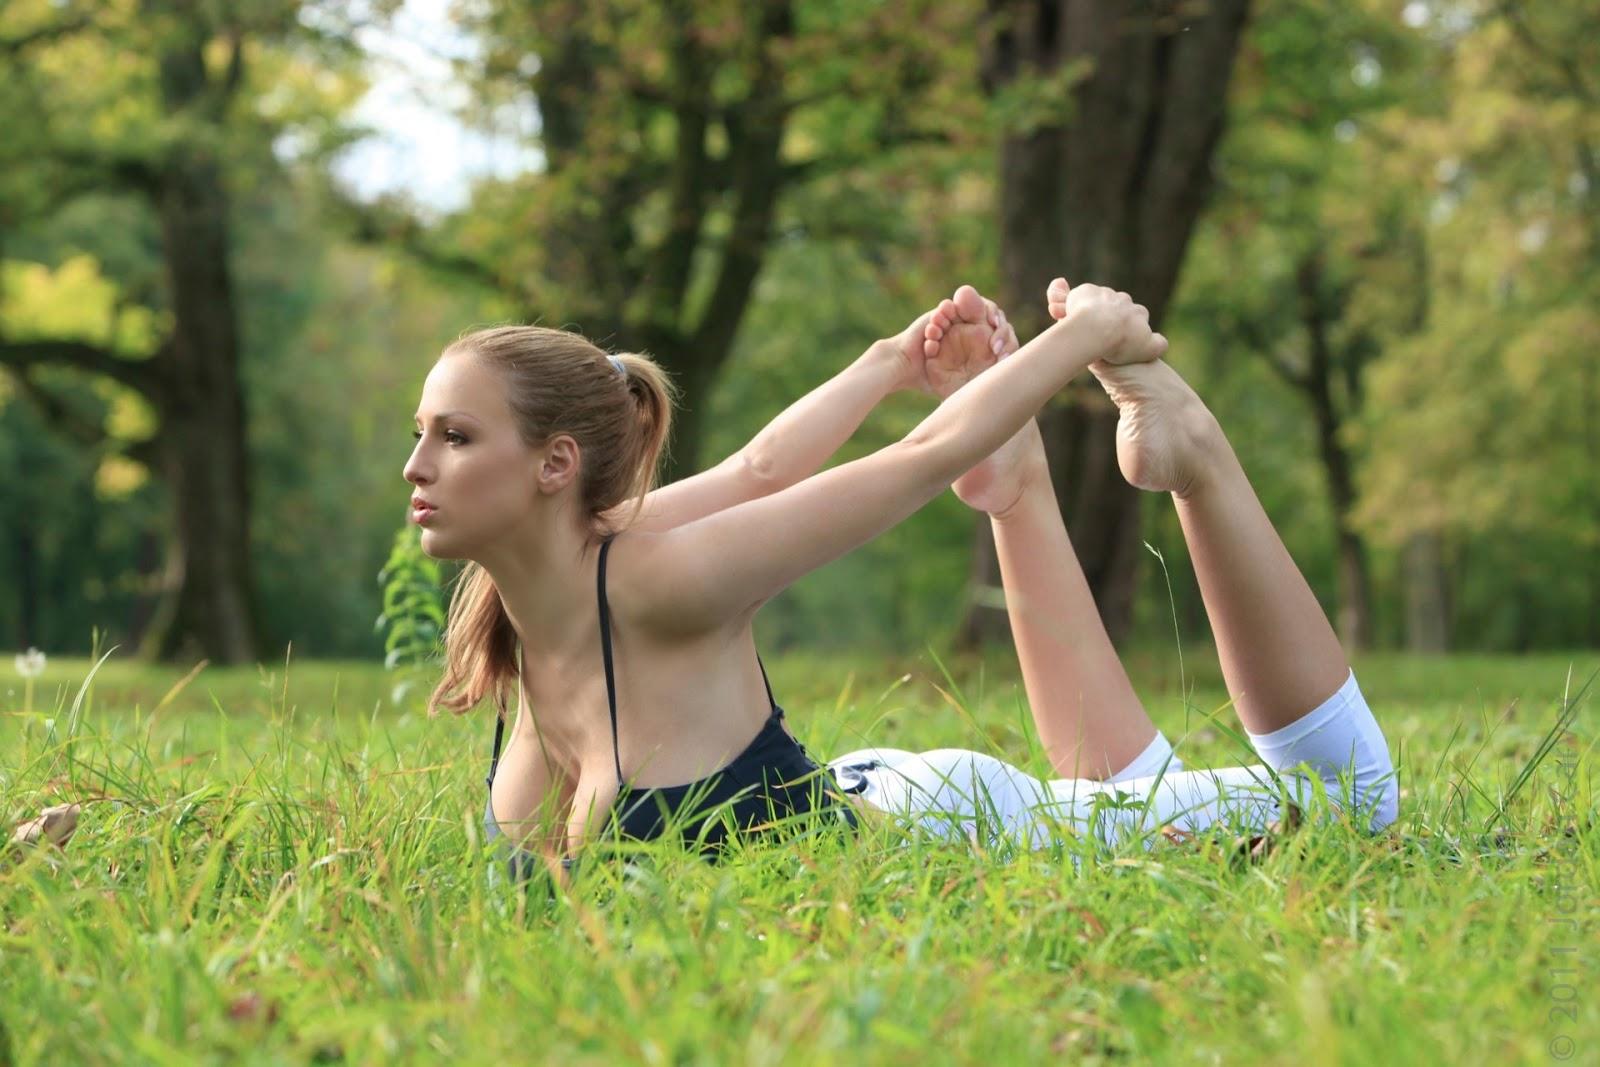 http://2.bp.blogspot.com/-PKKD_CAasew/T0OGaFcrSgI/AAAAAAAADck/0kzsfHzqdpA/s1600/Jordan-Carver-Yoga-5.jpg